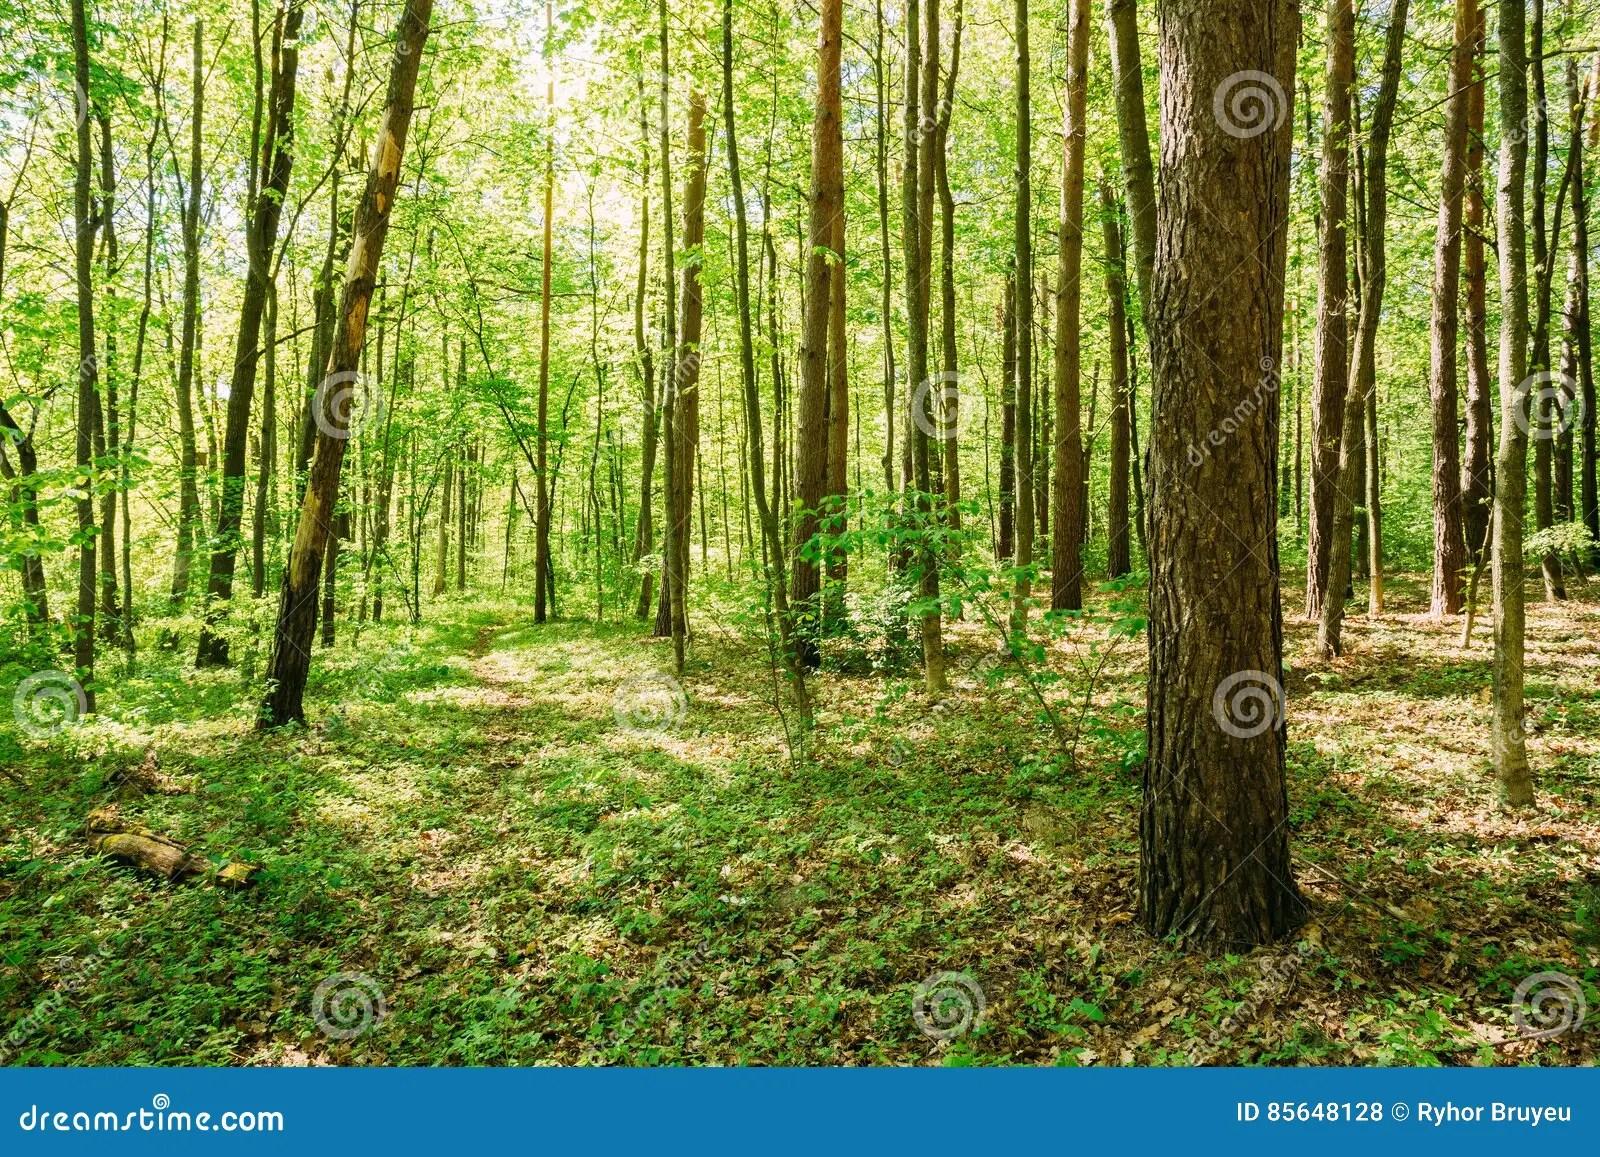 Spring Summer Maple Trees Woods Sunlight In Deciduous